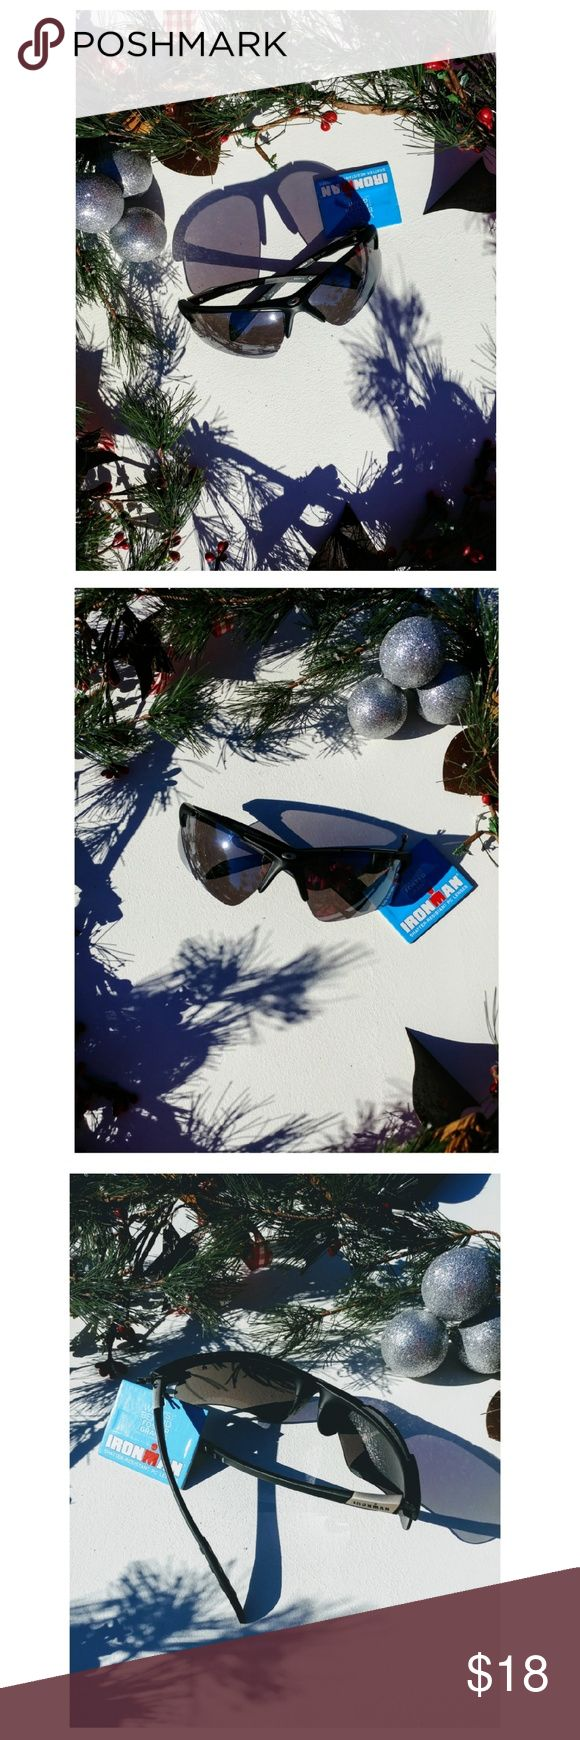 New Foster Grant Ironman Sunglasses New Foster Grant Ironman Sunglasses Foster Grant Accessories Sunglasses